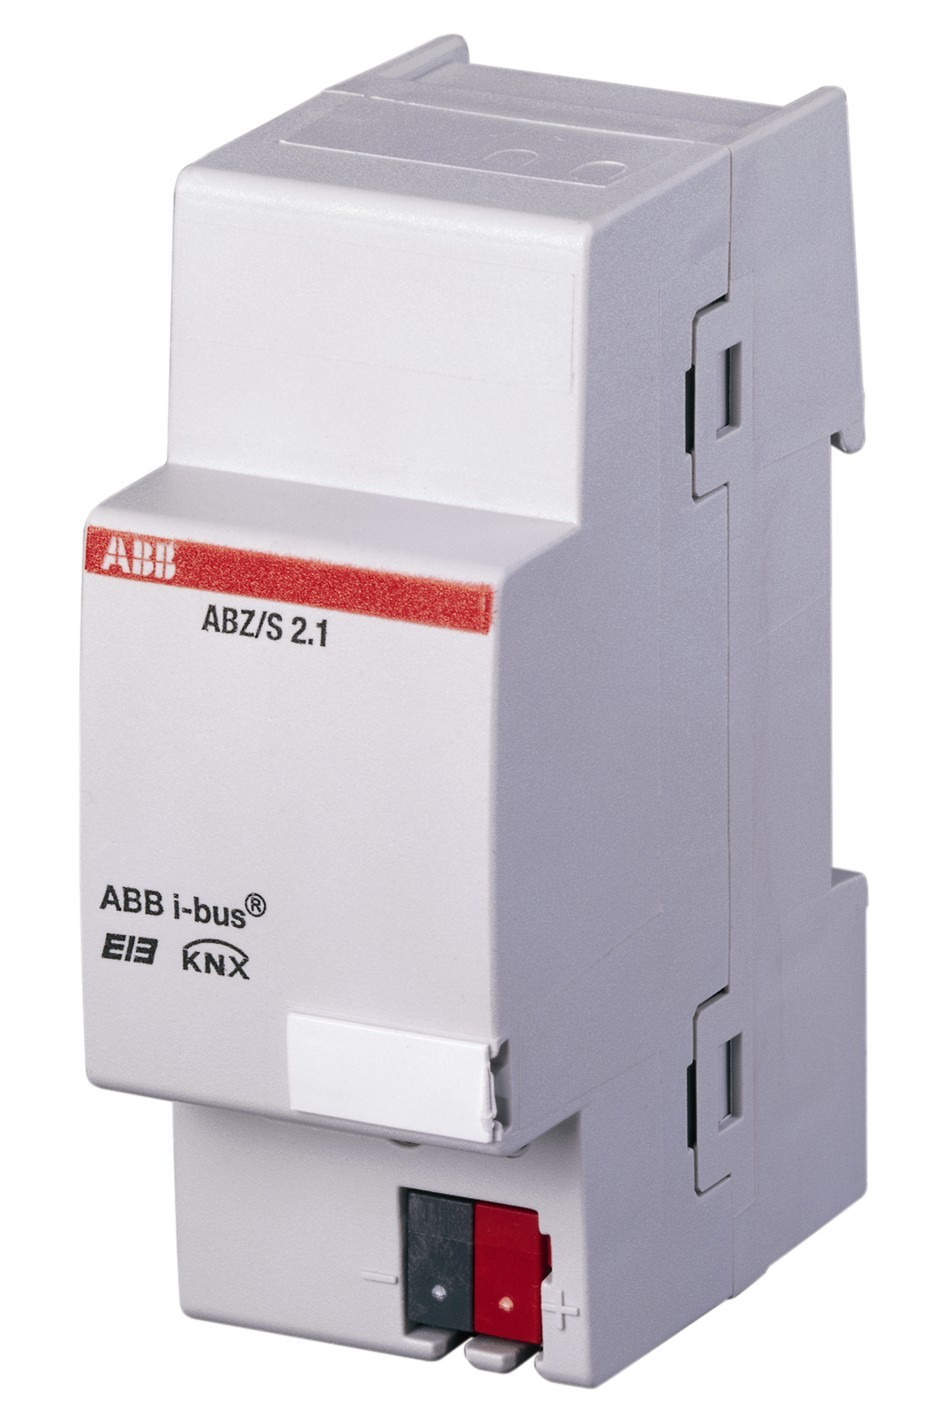 ABB Applikationsbaustein Zeit ABZ/S 2.1 2CDG110072R0011